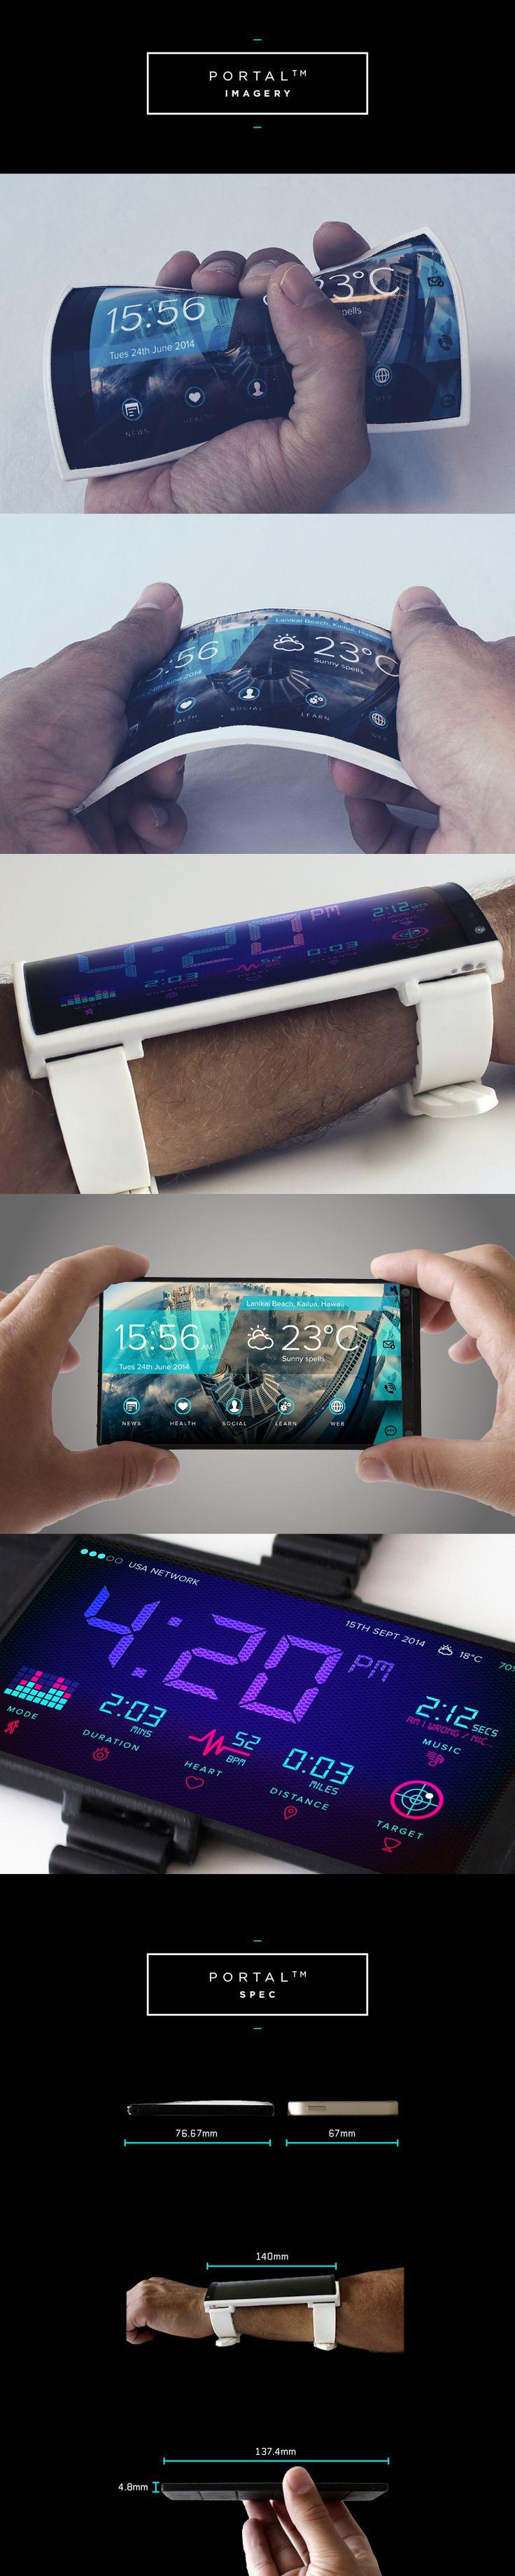 Portal Wearable Smartphone DisruptOverload | Indiegogo @swedfonenet